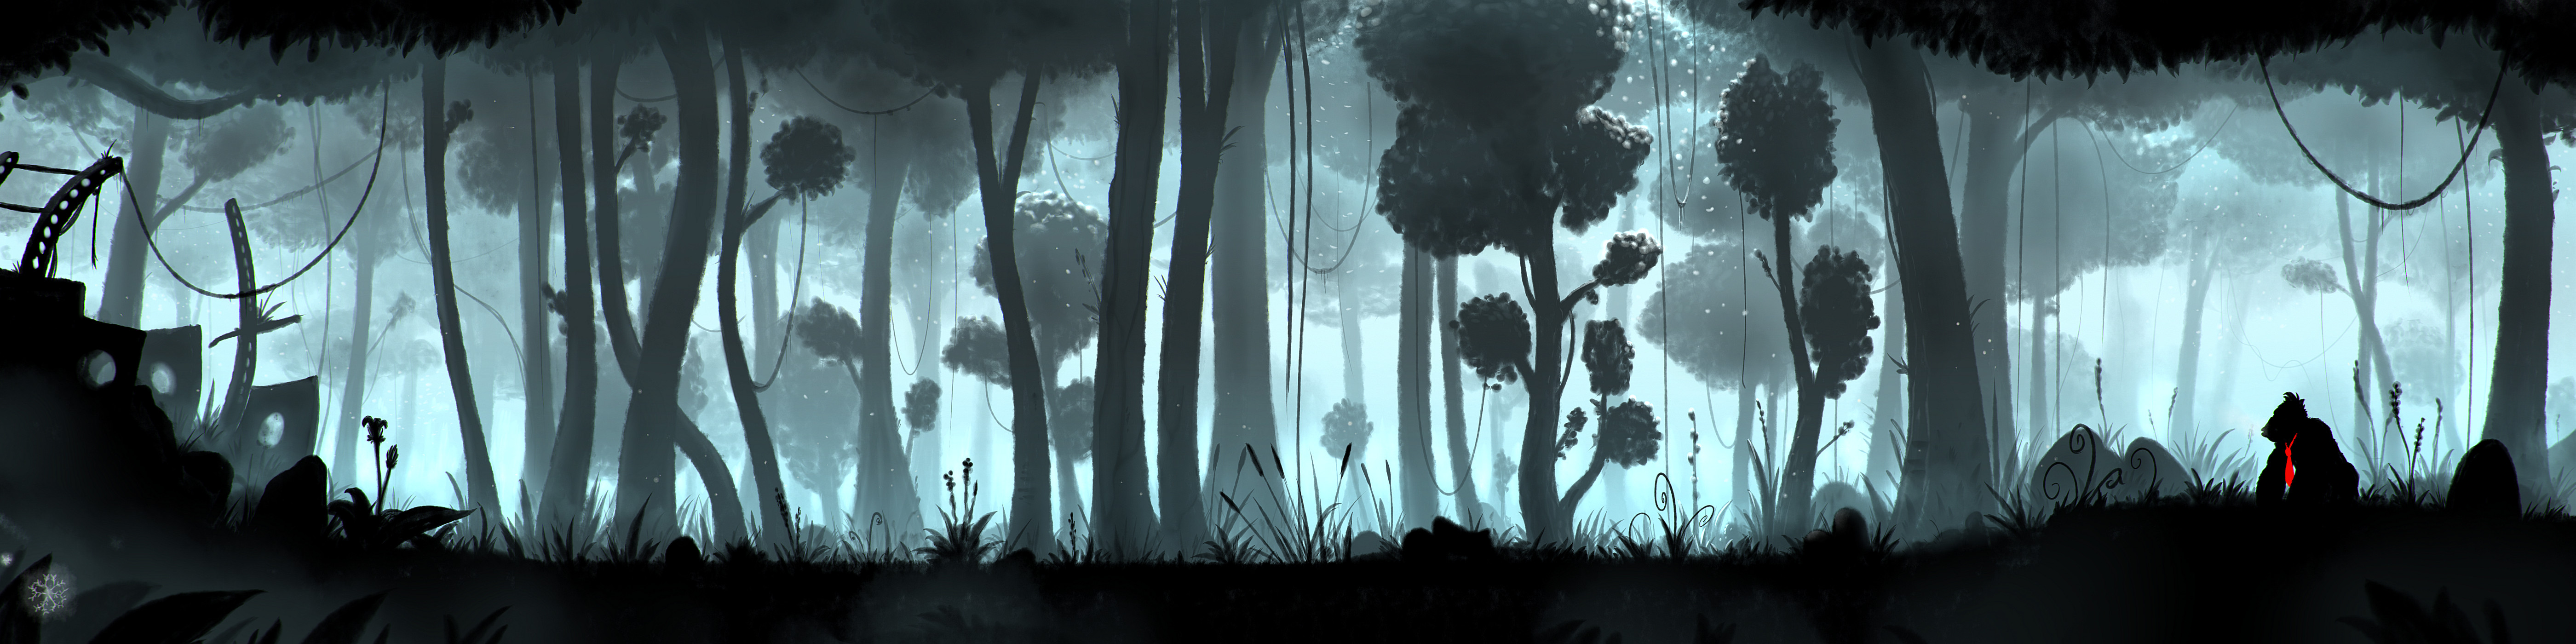 Silhouette Forest — Weasyl